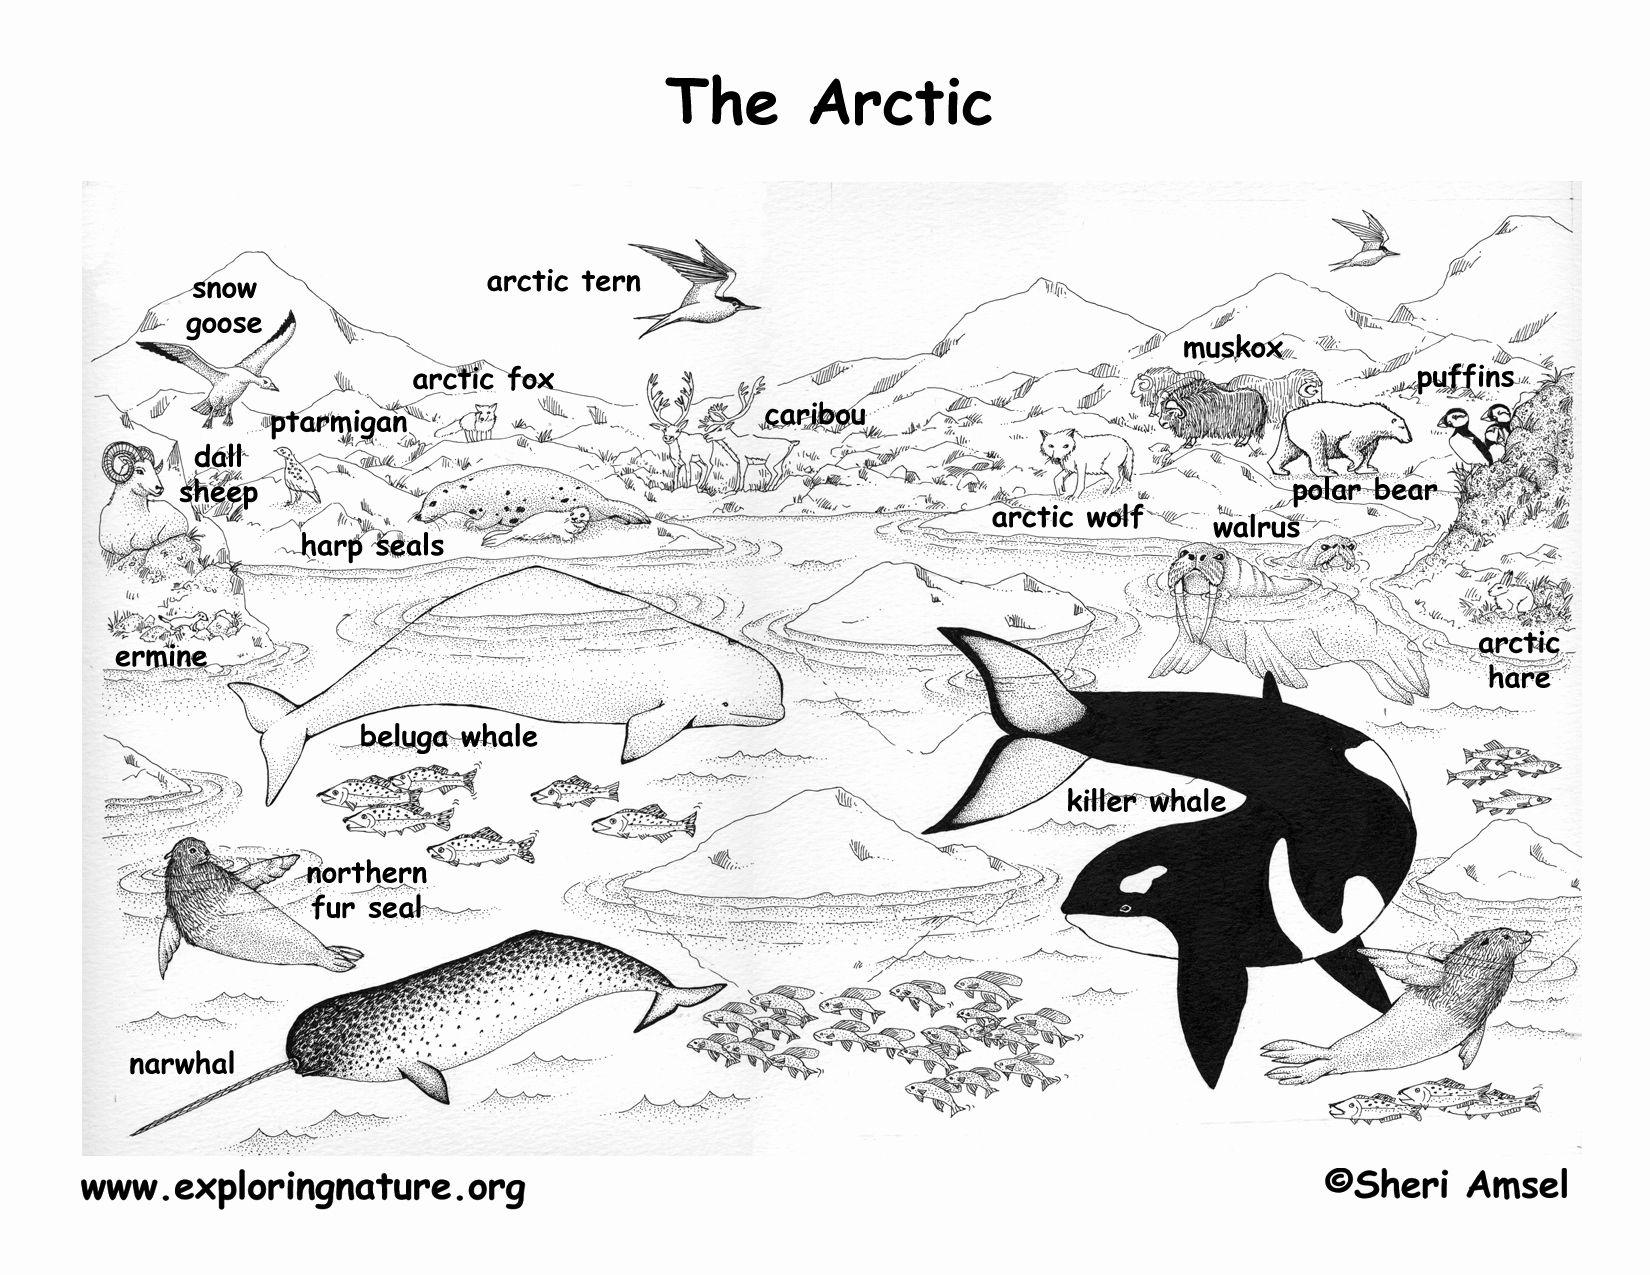 Animal Habitat Coloring Pages Luxury Arctic And The Tundra Arctic Habitat Arctic Animals Artic Animals